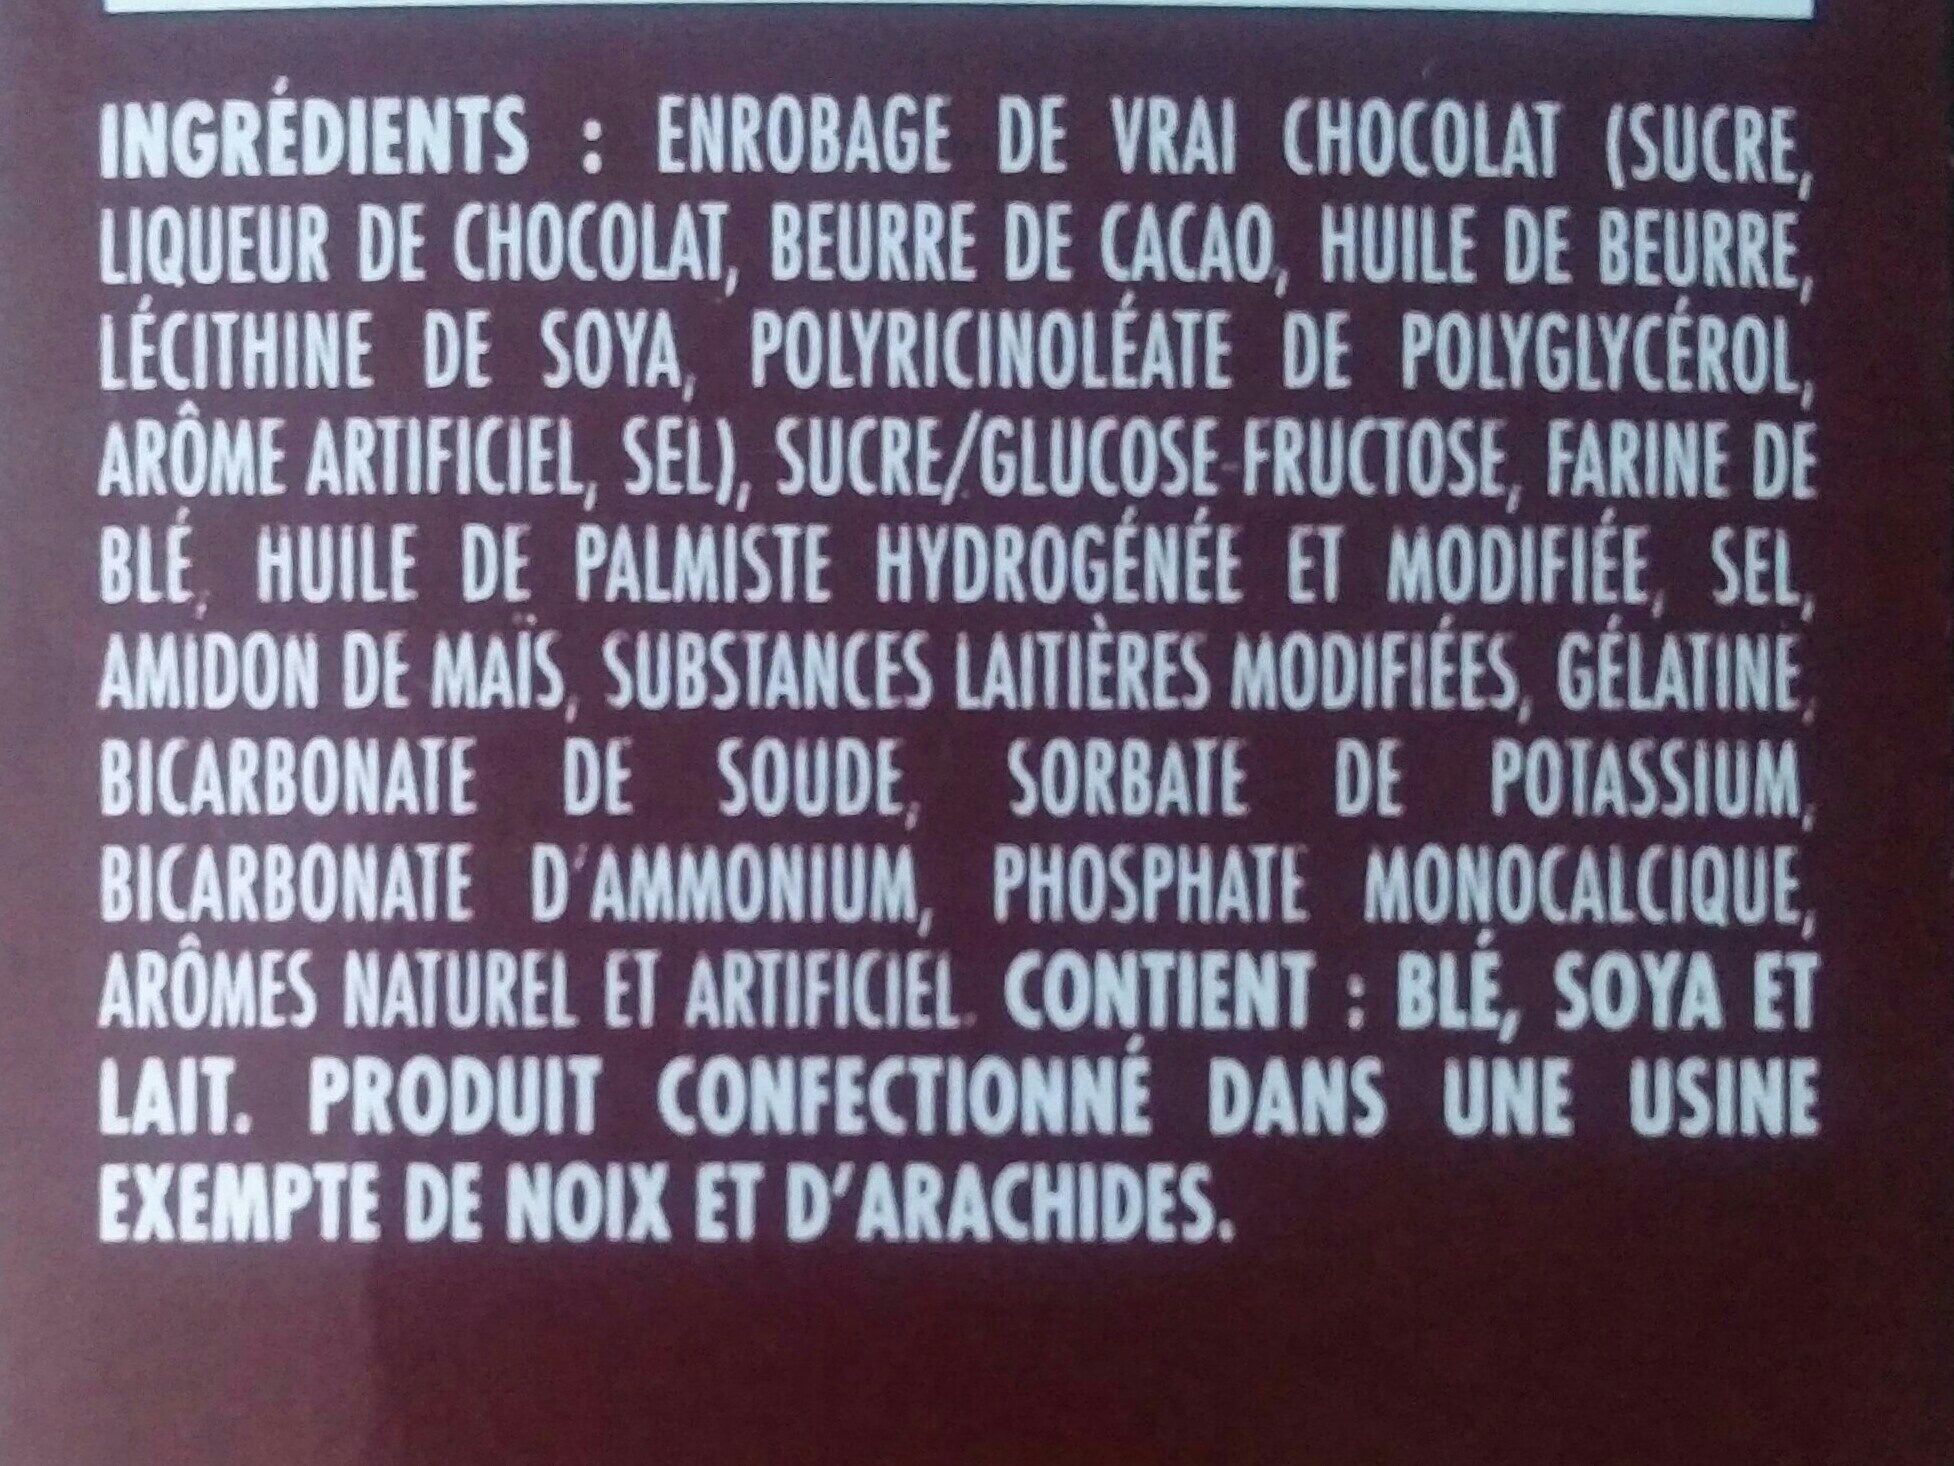 Whippet original - Ingredients - fr